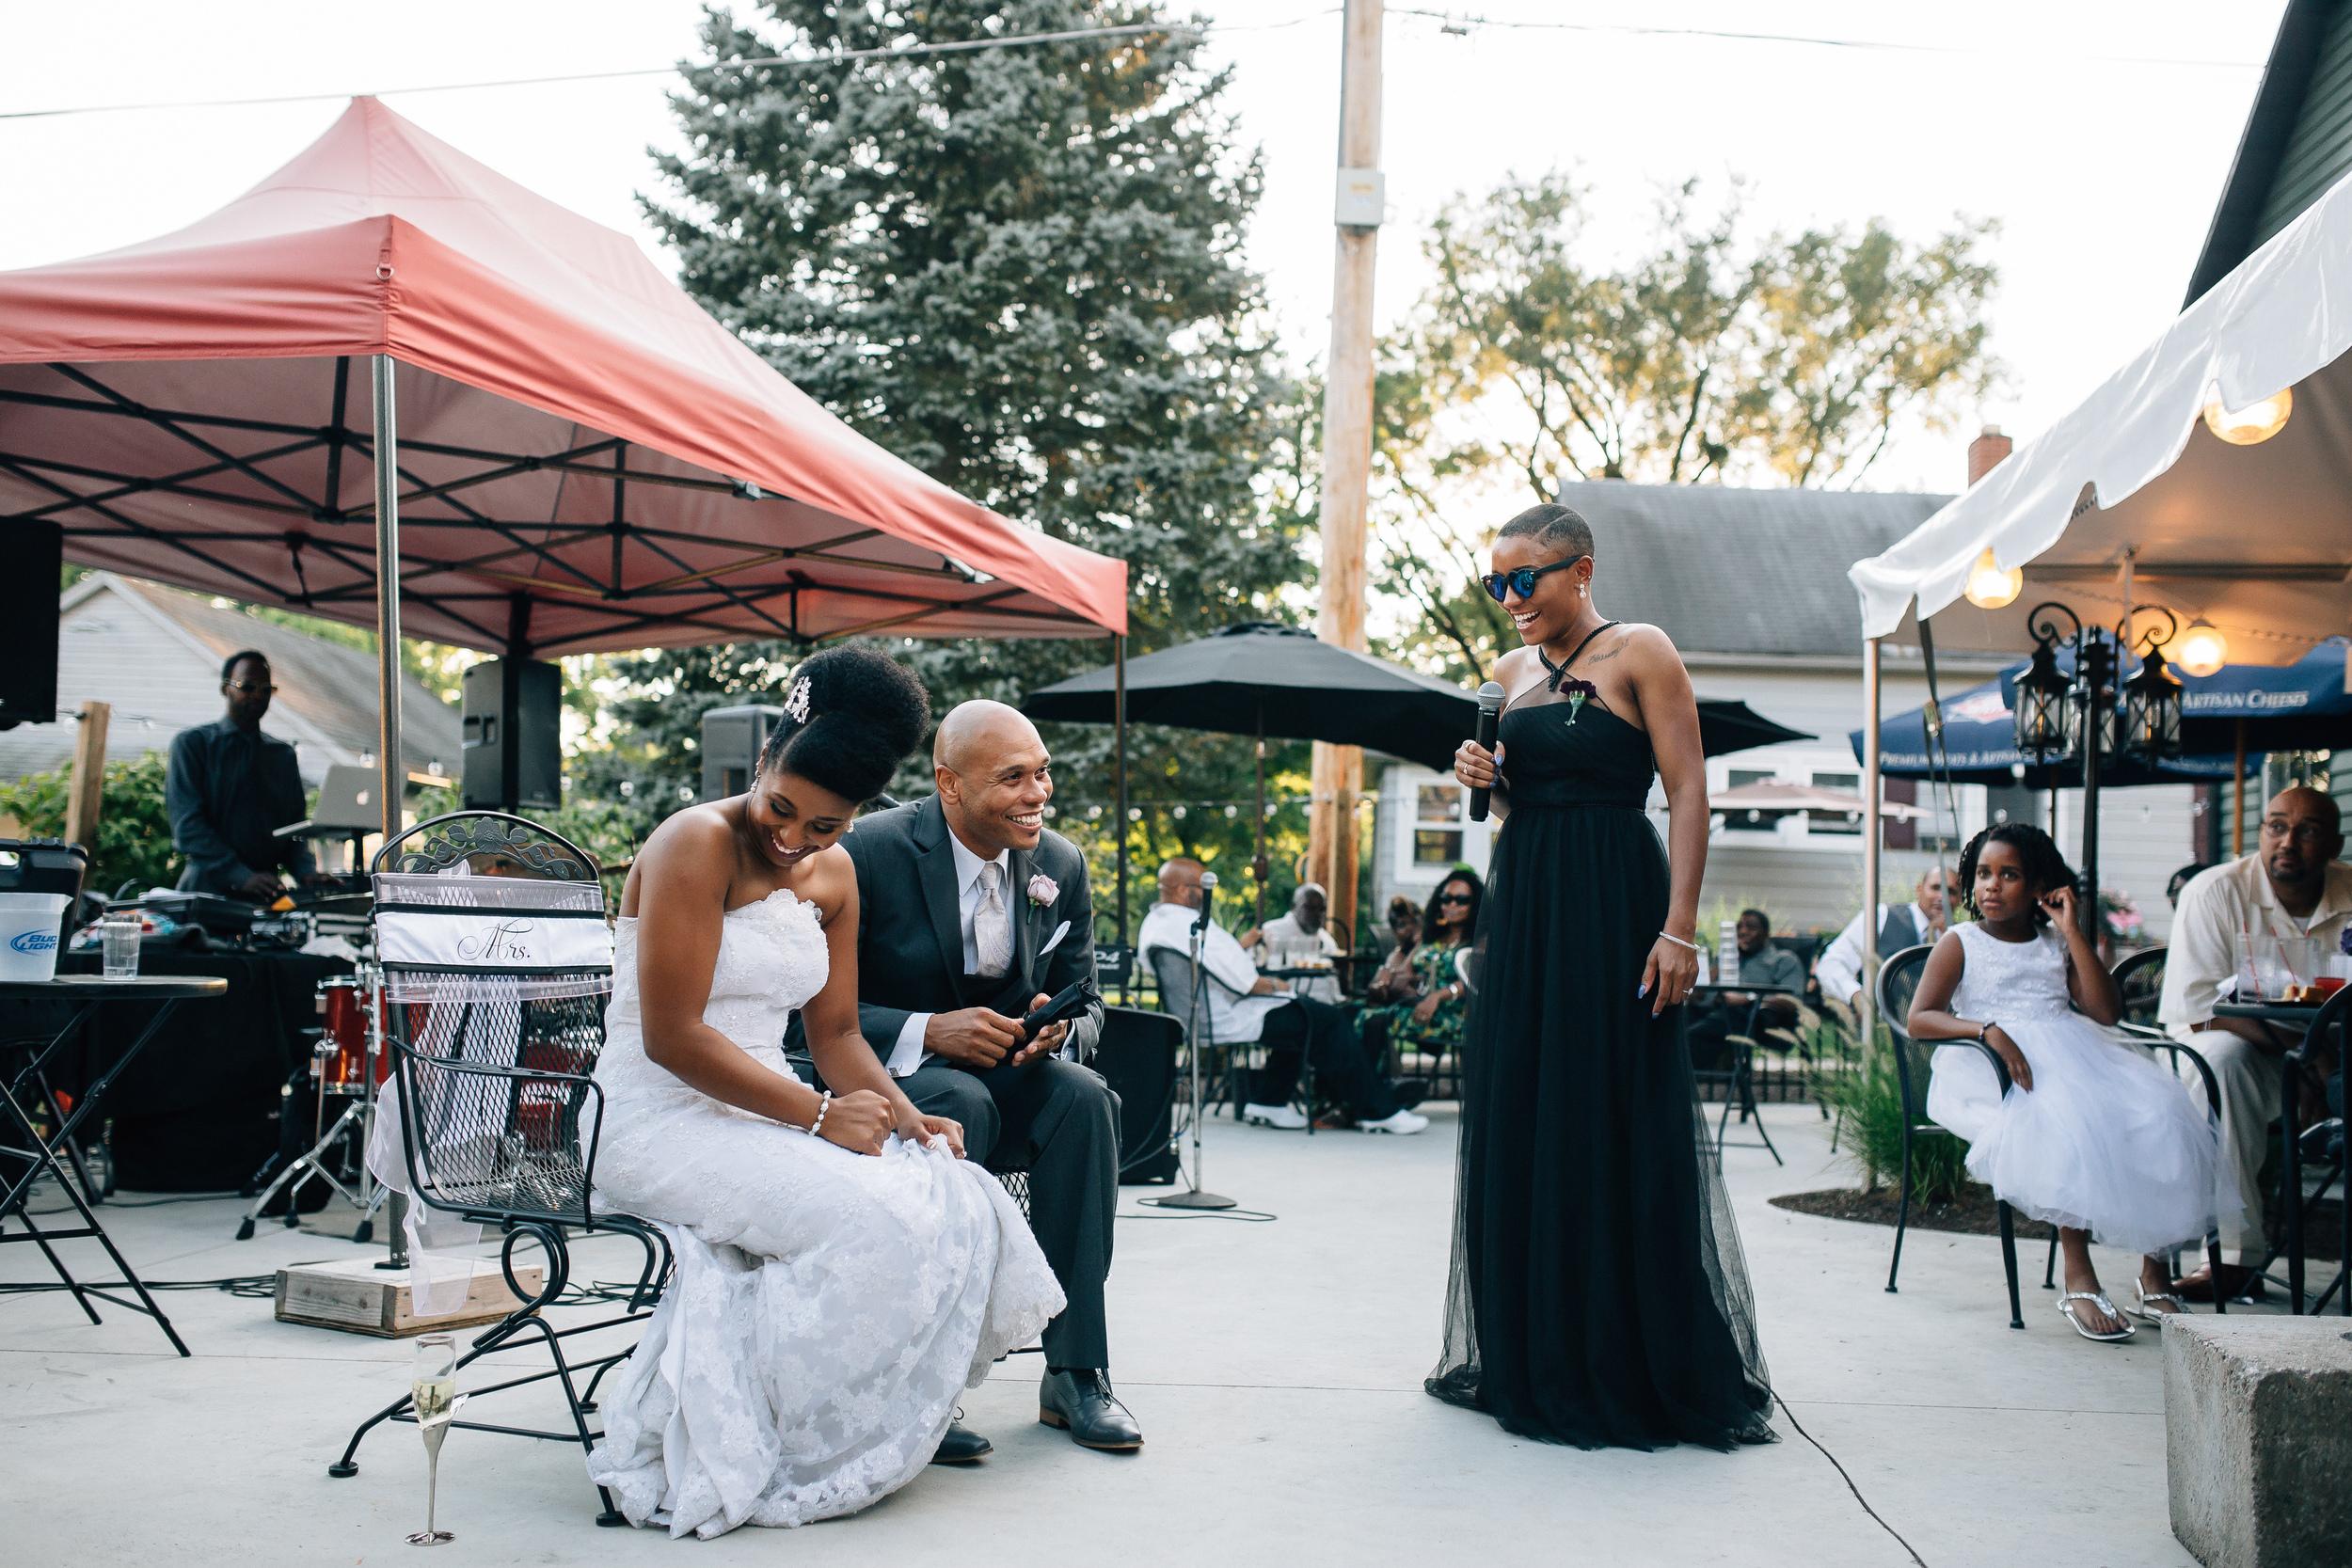 Chuck & Alicia's Wedding - Corrie Mick Photography-599.jpg